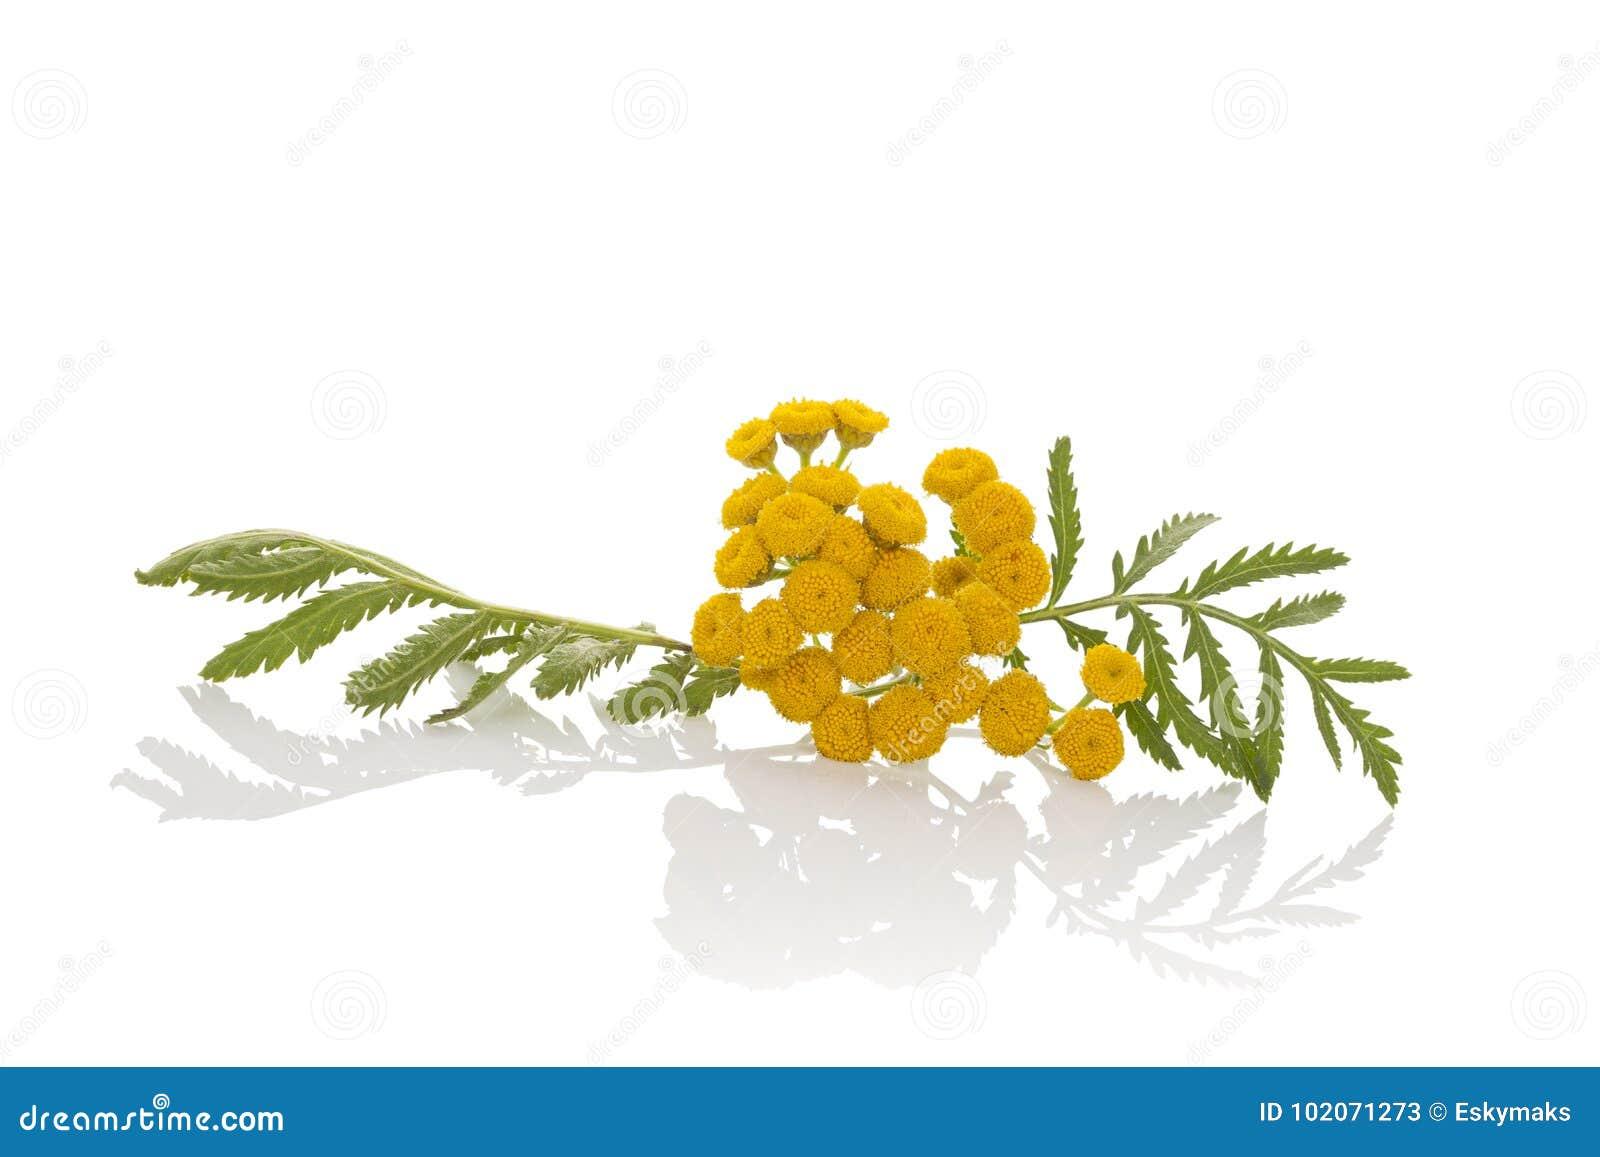 Tanaceto, tanacetum vulgare